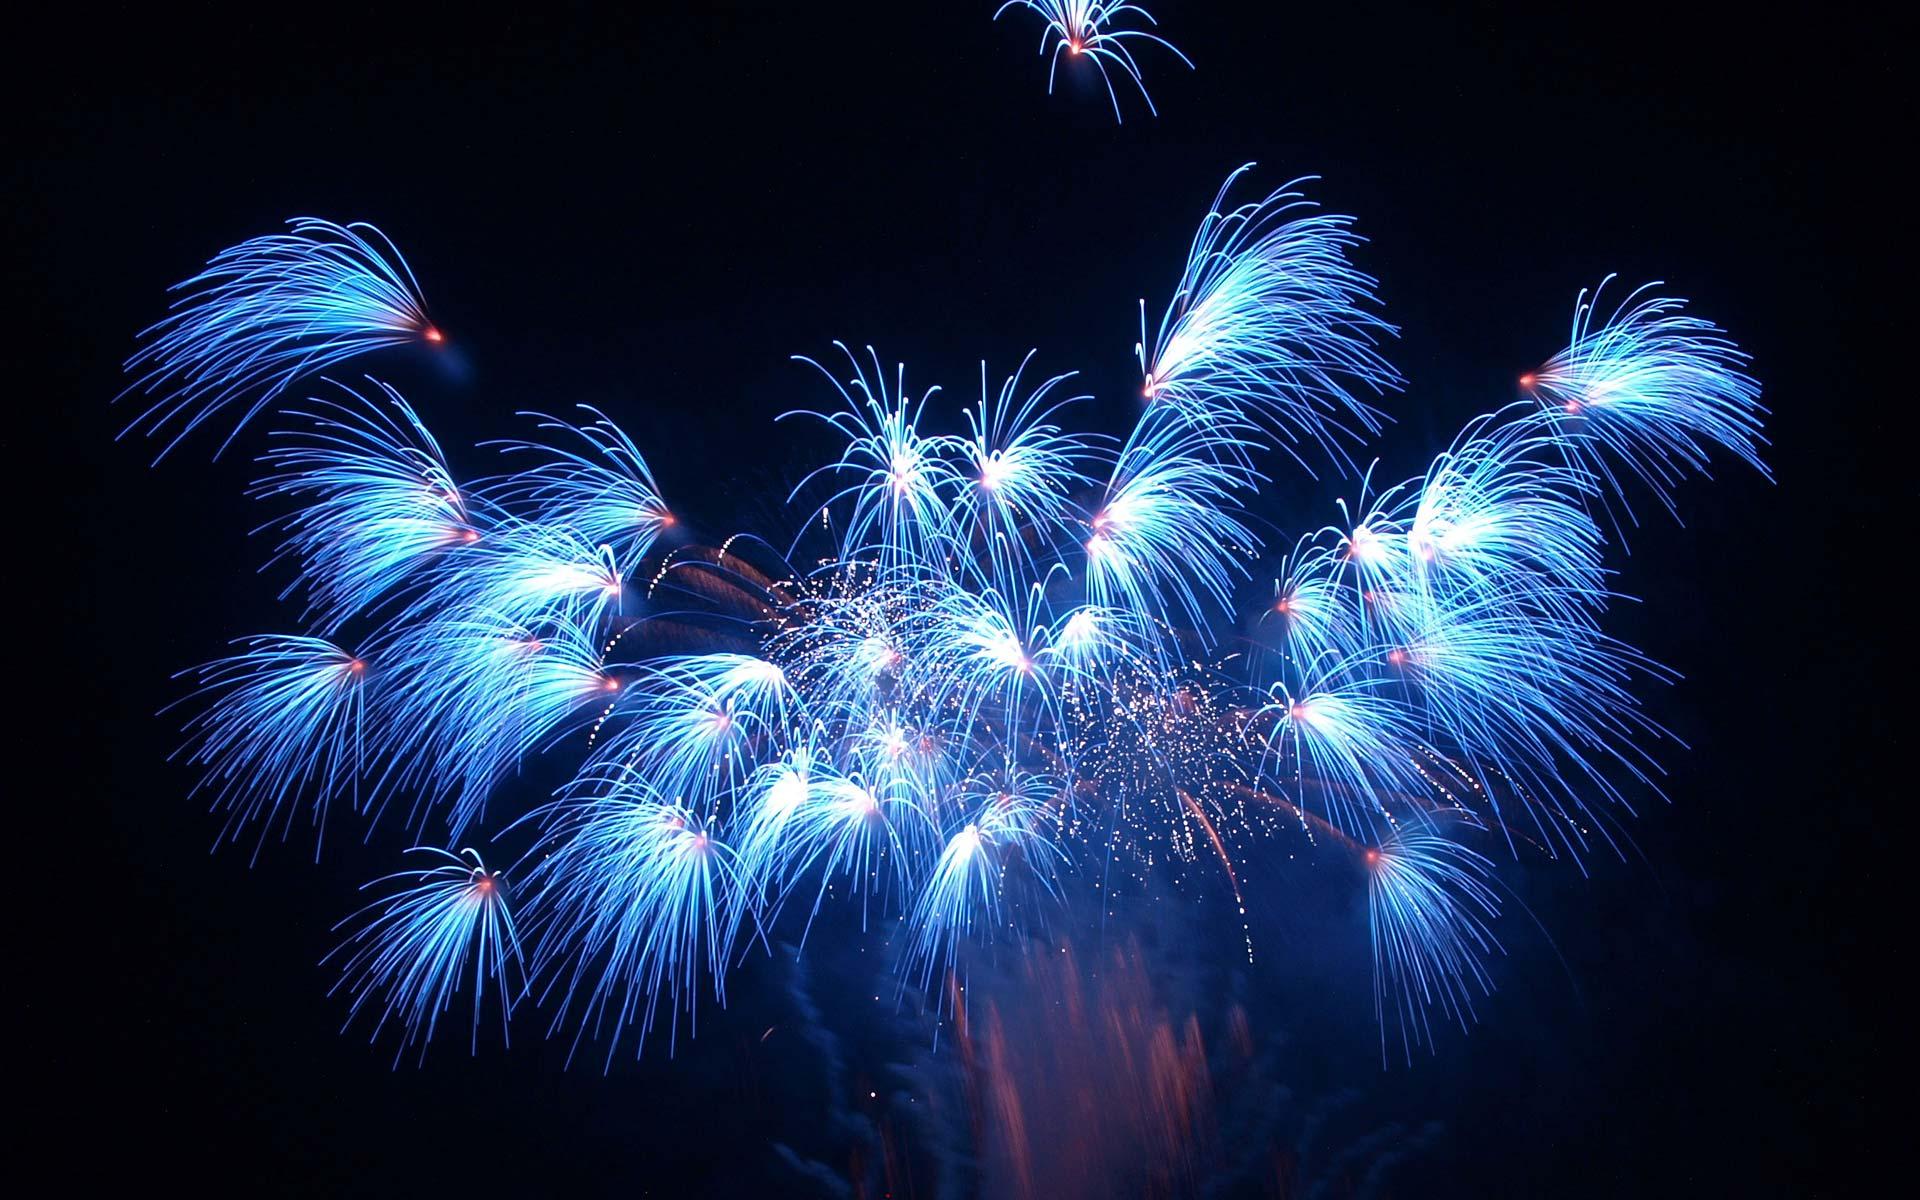 Fireworks-HD-Fireworks-Background-HD-wallpaper-wpc5804804